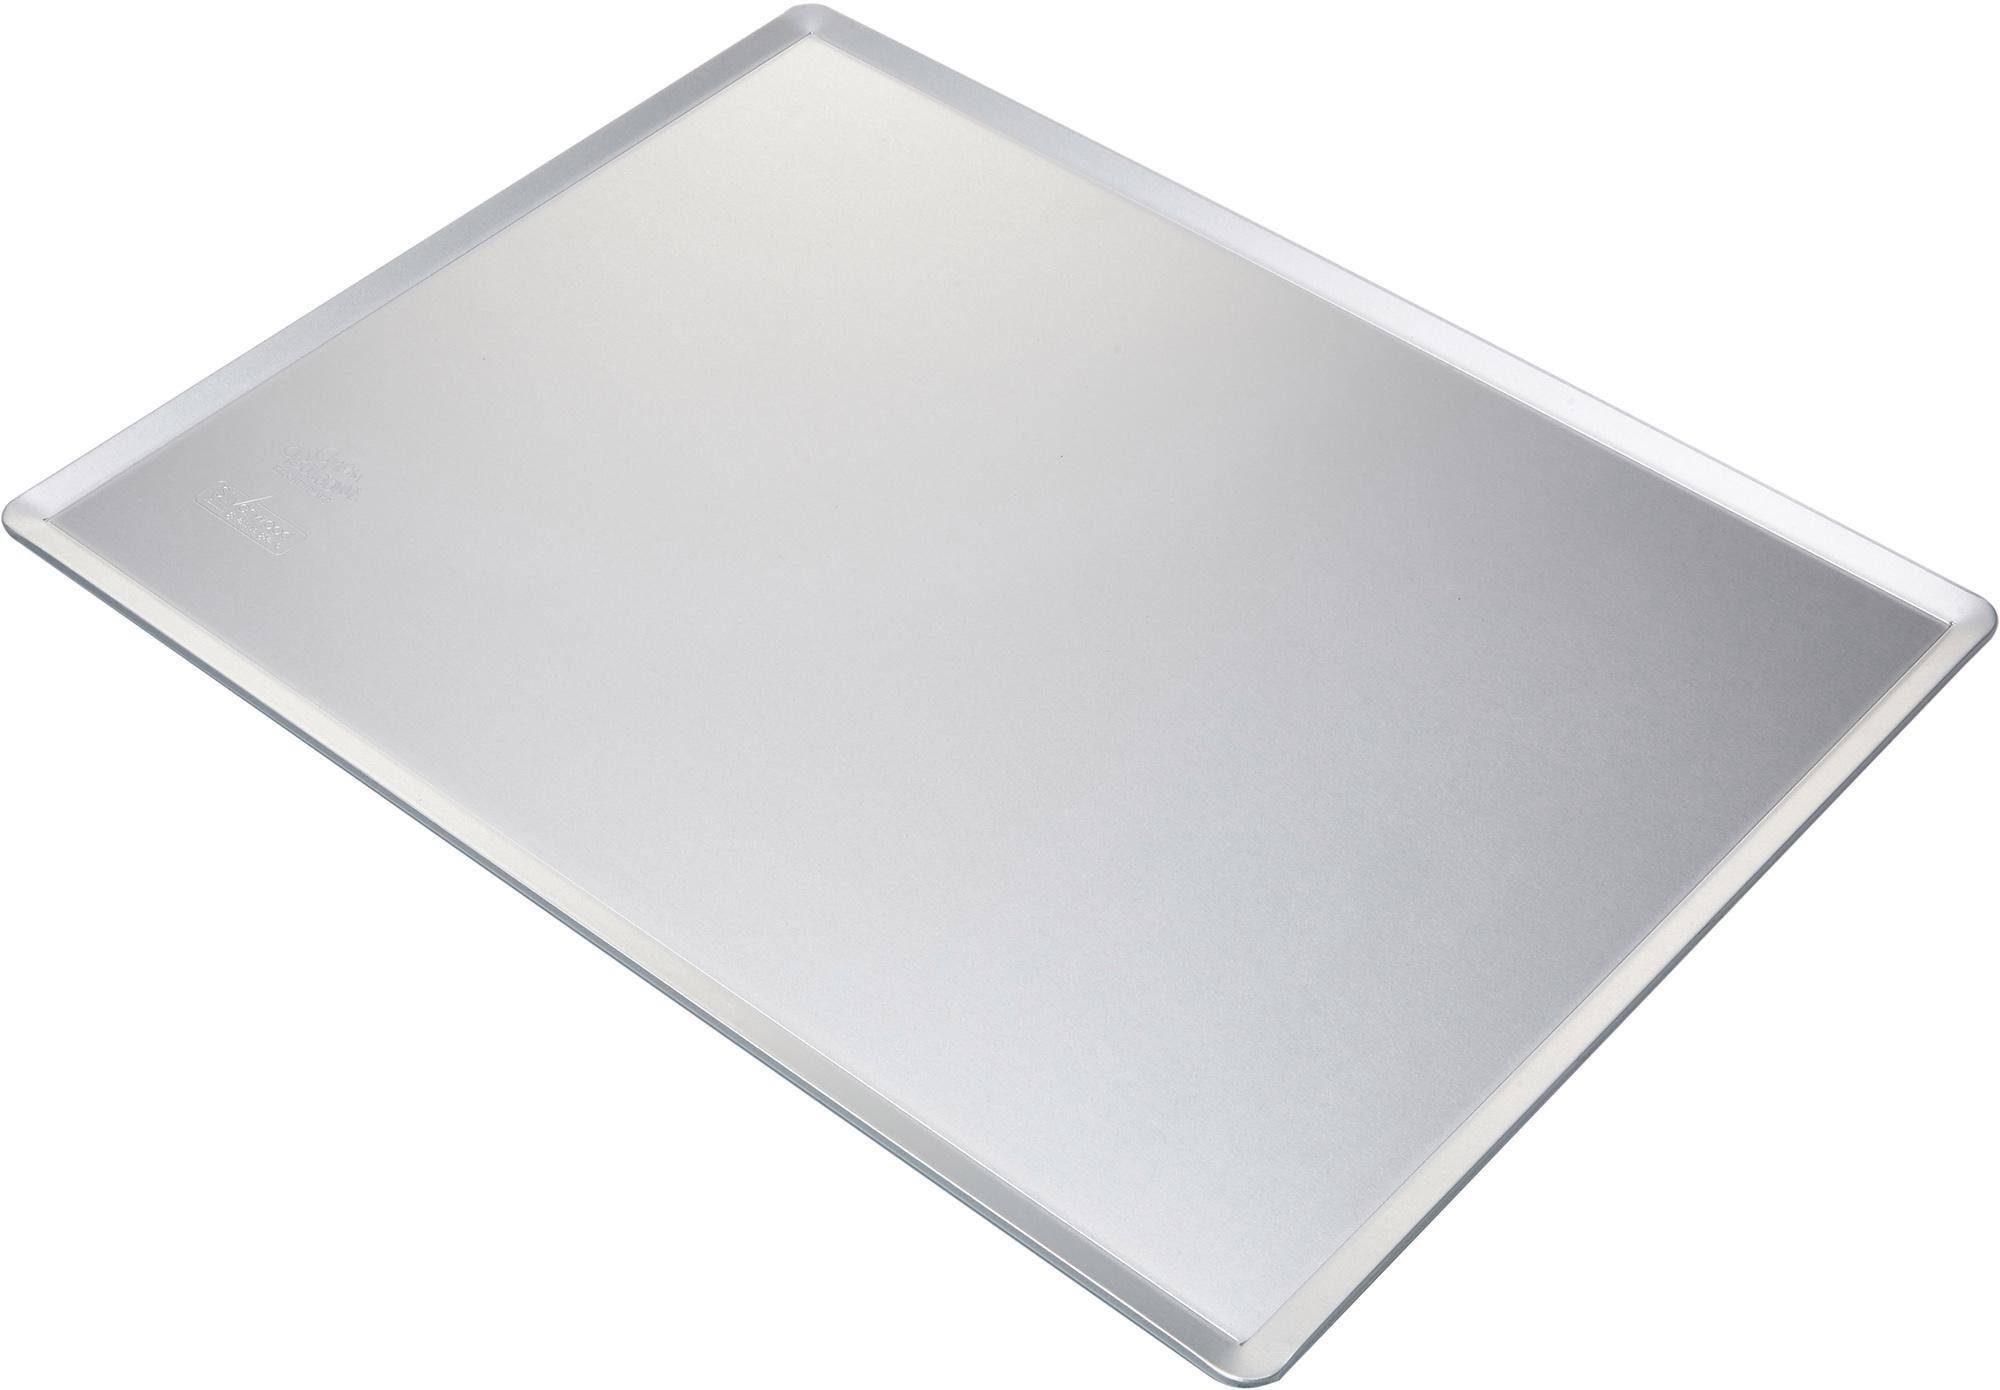 Cynthia Barcomi Backblech, Aluminium, 44 x 34 cm